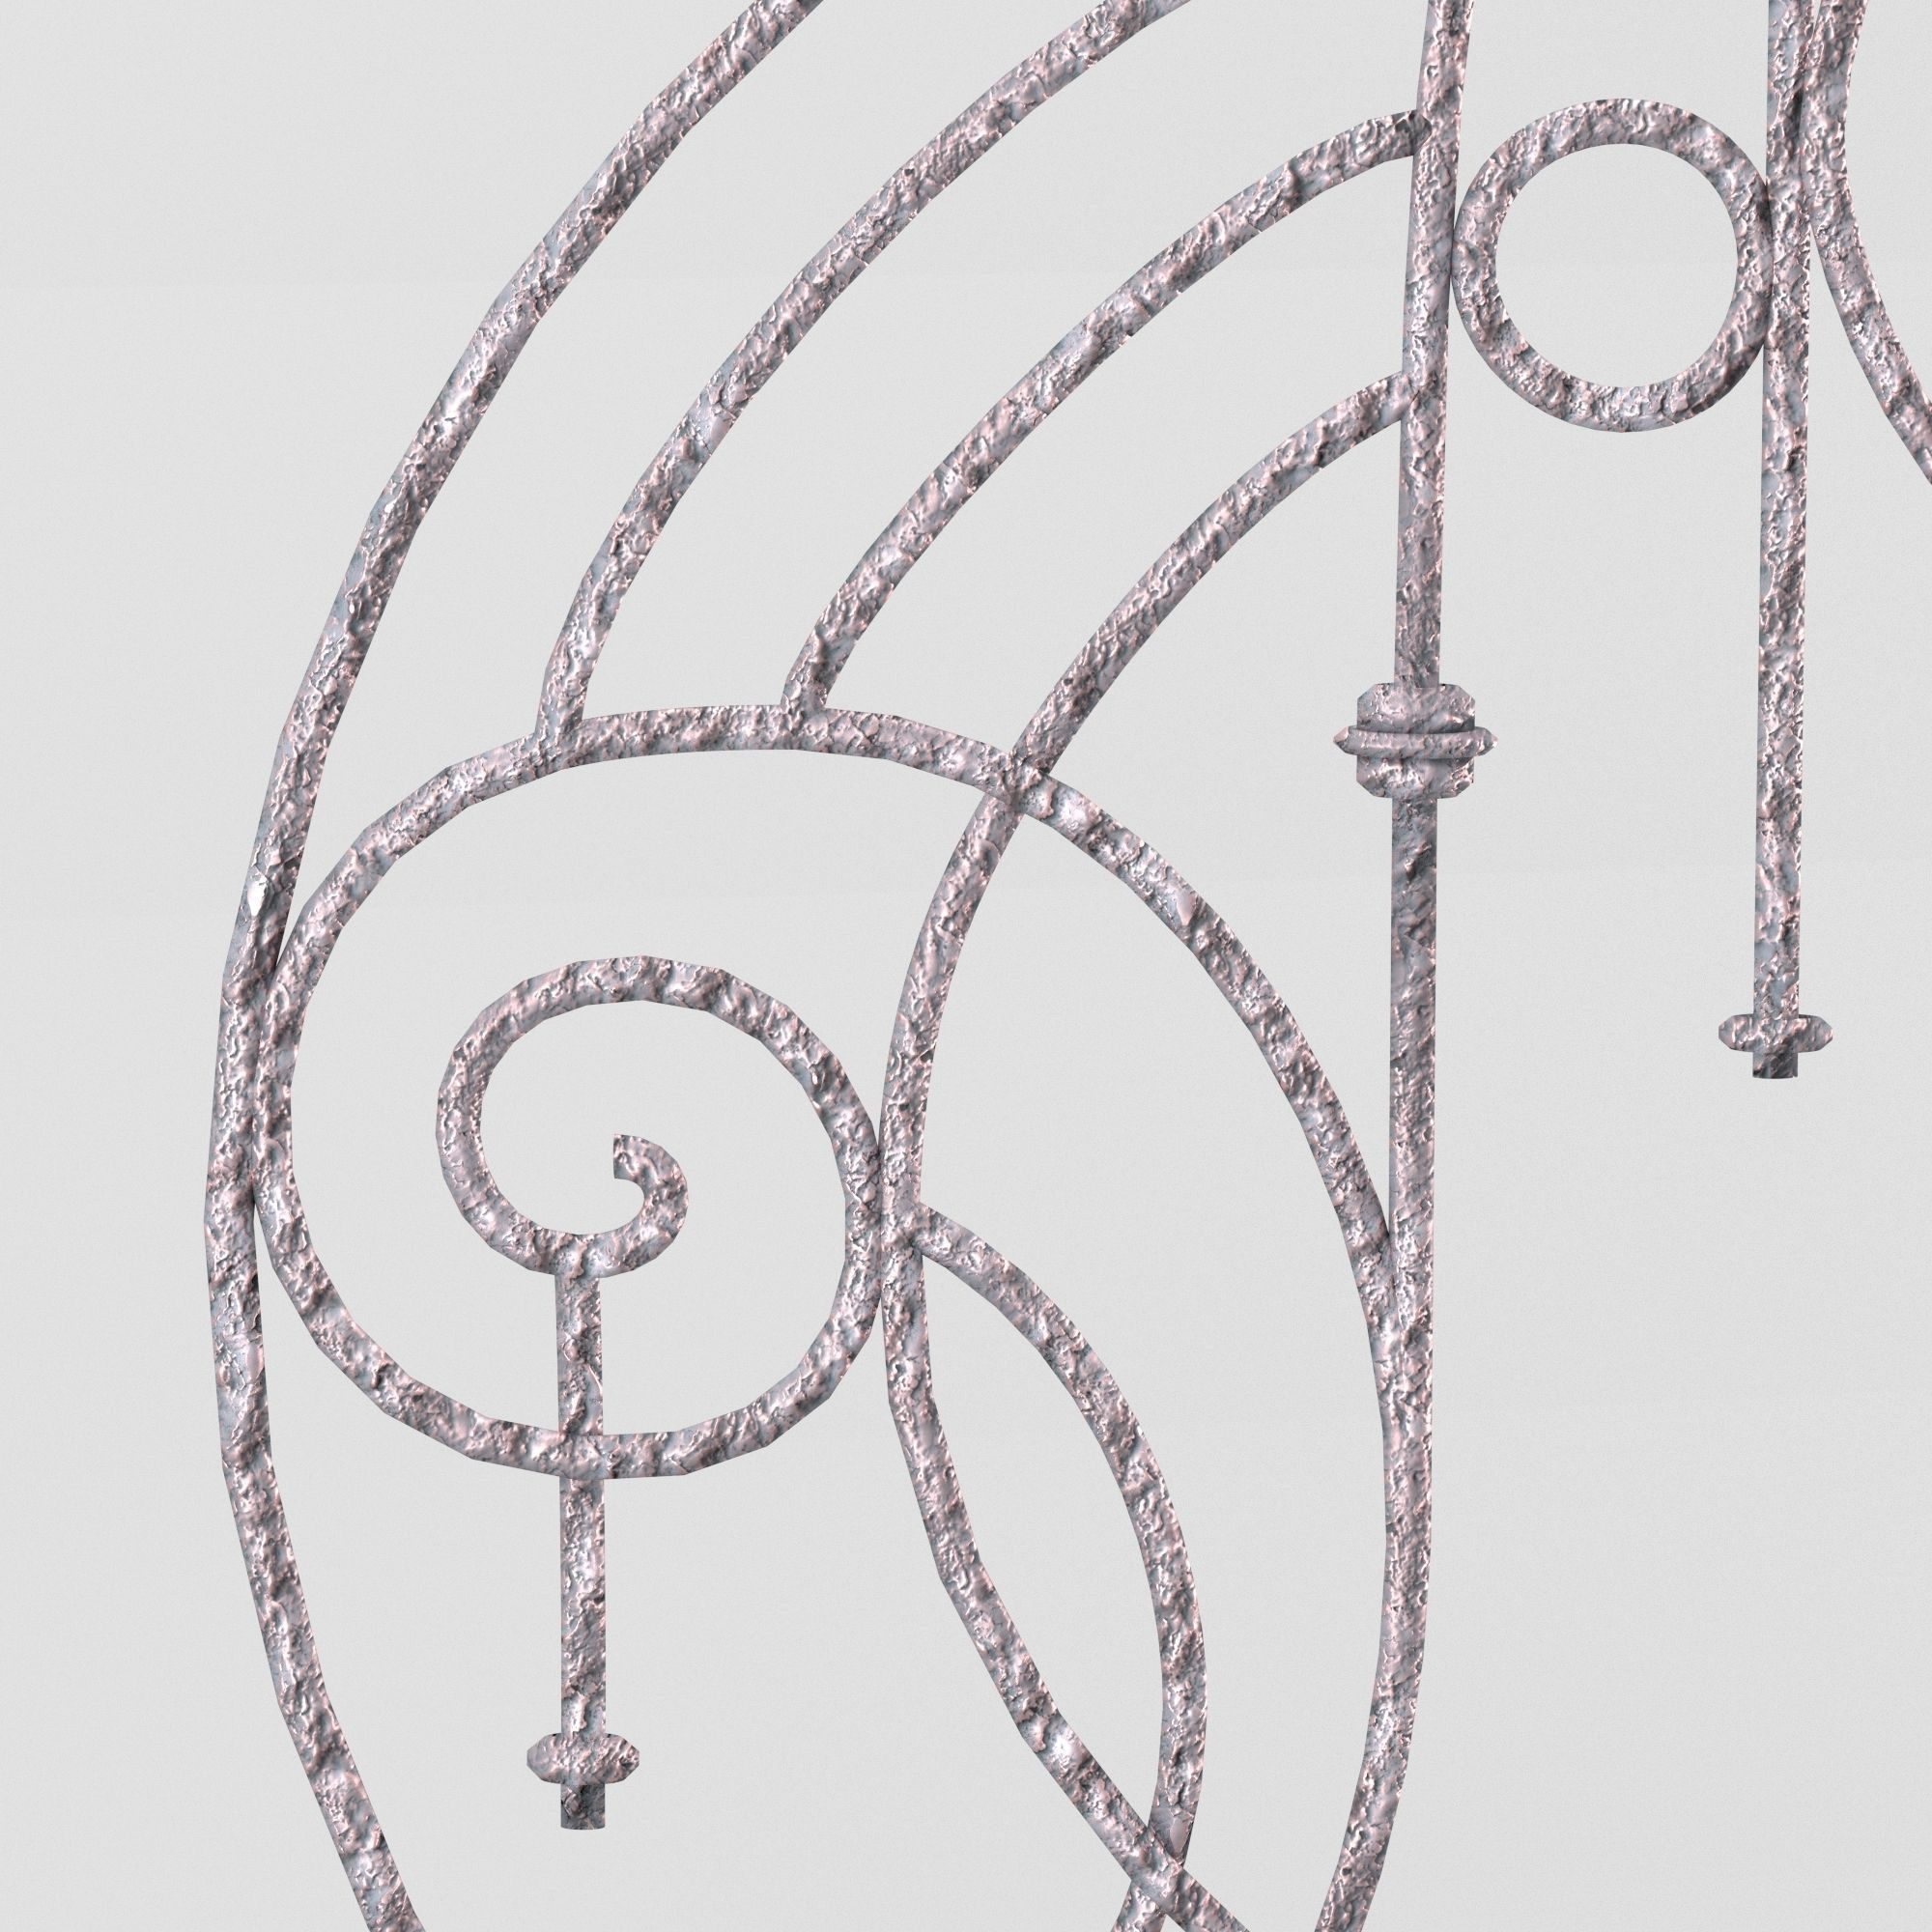 Decorative wrought iron lattice in retro s... 3D Model